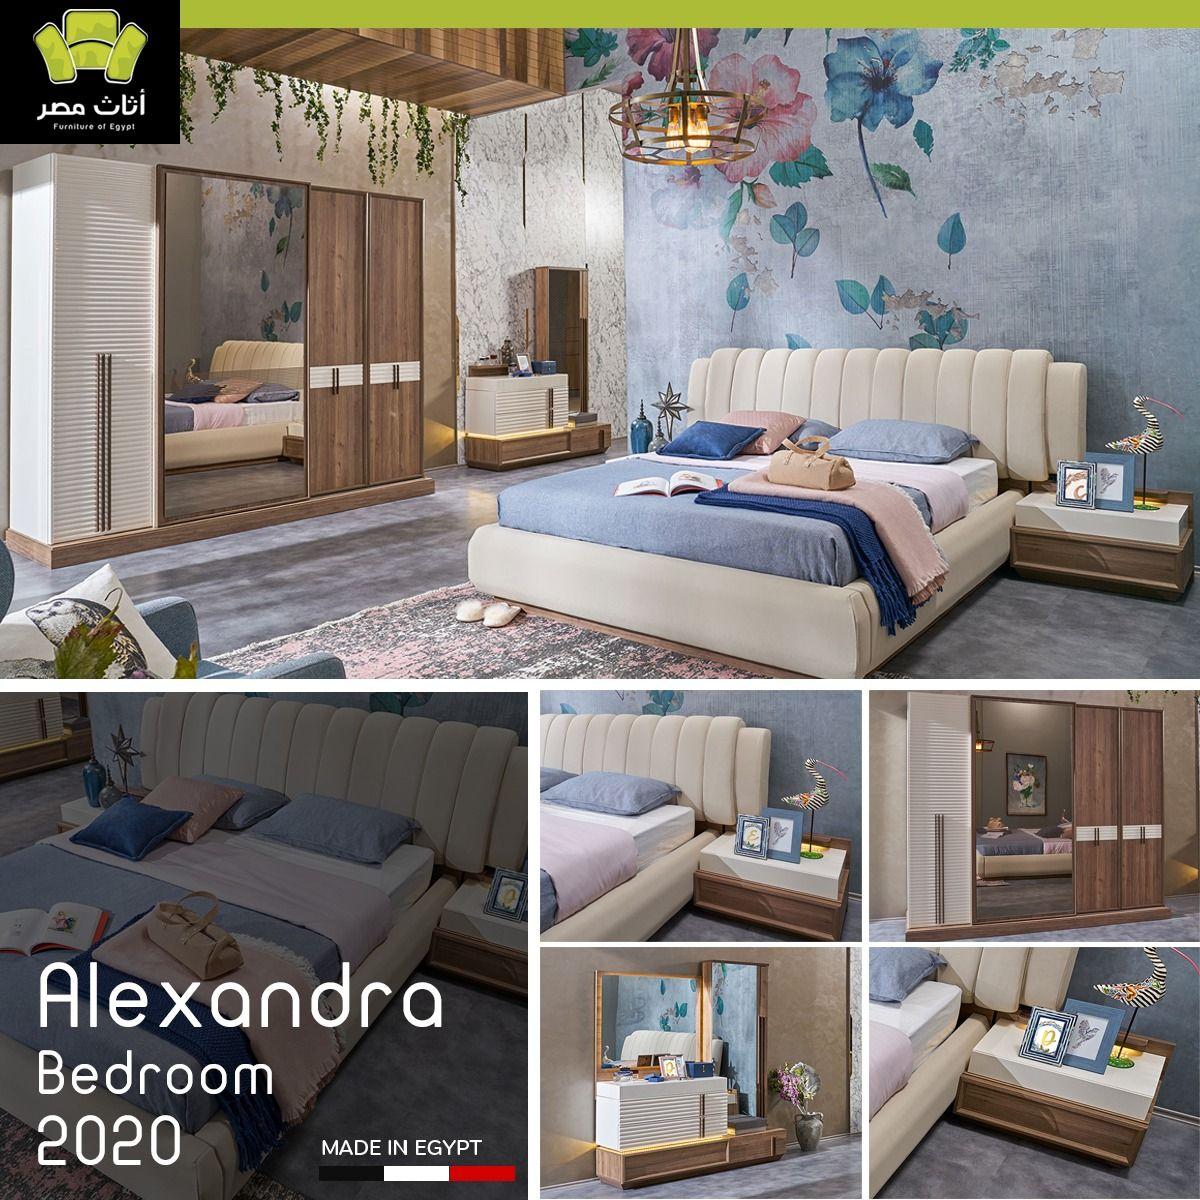 غرفة نوم الكساندرا 2020 فقط وحصريا من أثاث مصر Bed Design Modern Bedroom Furniture Design Home Room Design